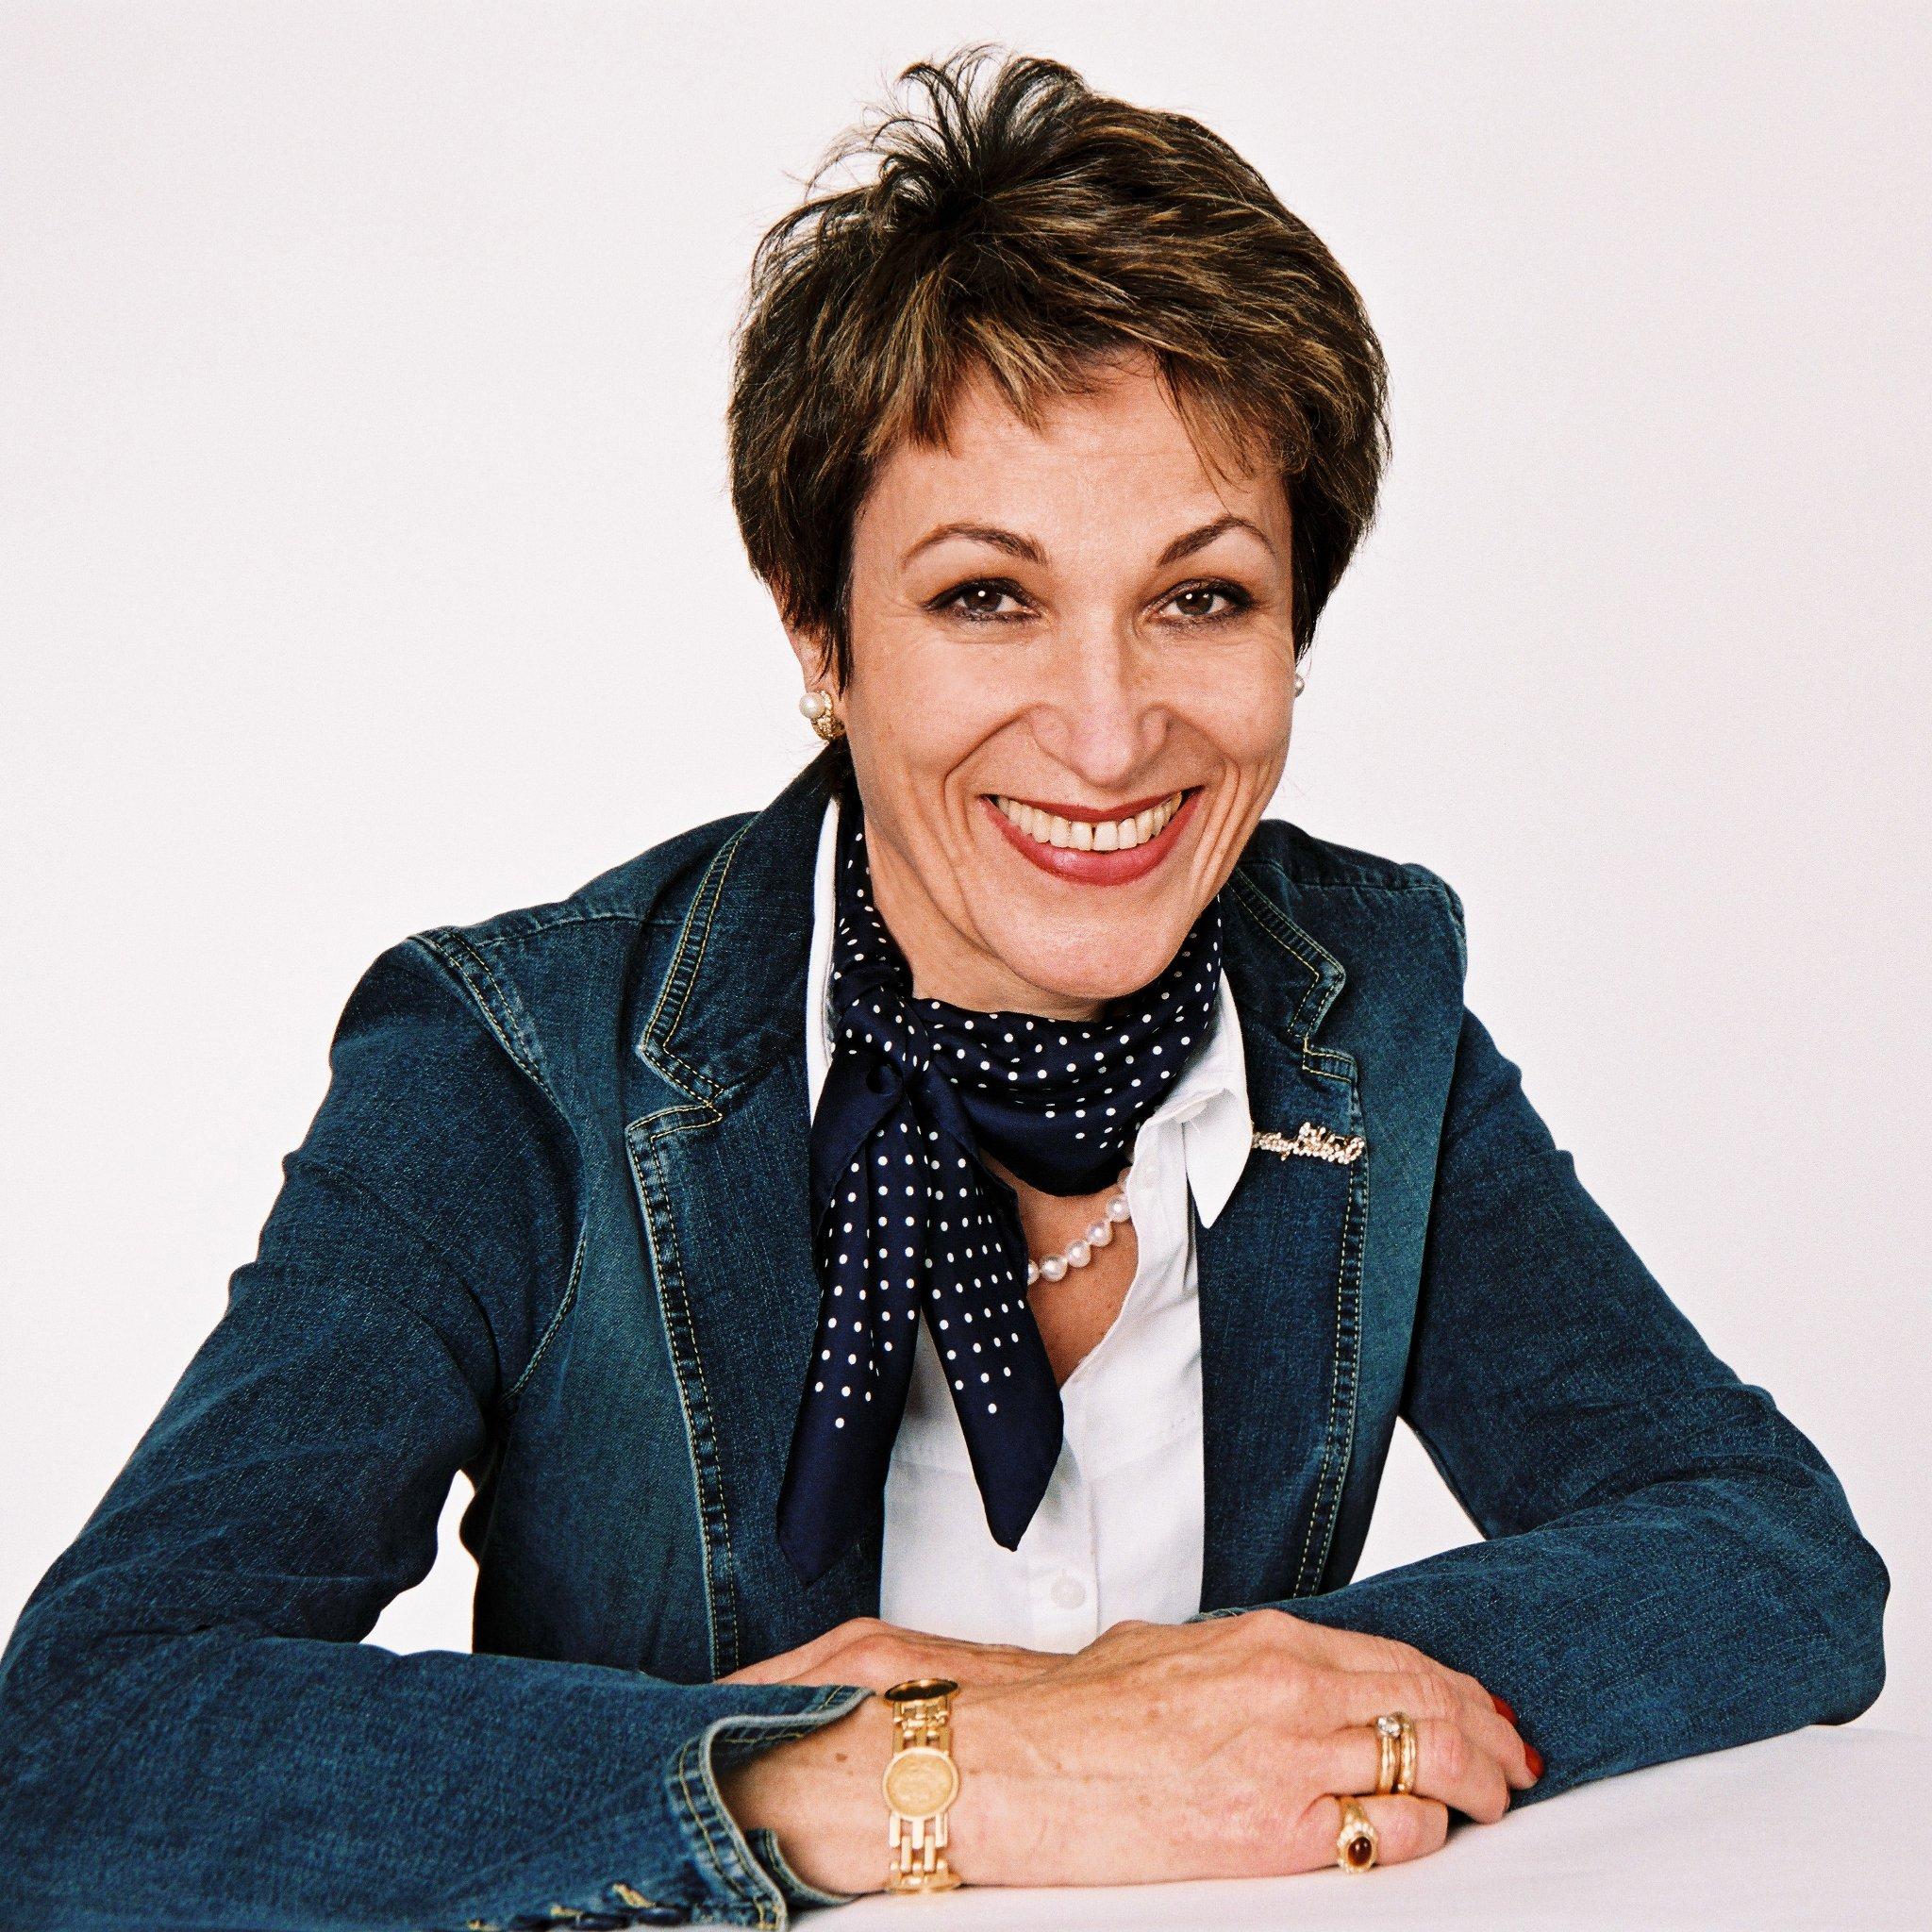 Béatrice G. Lombard-Martin